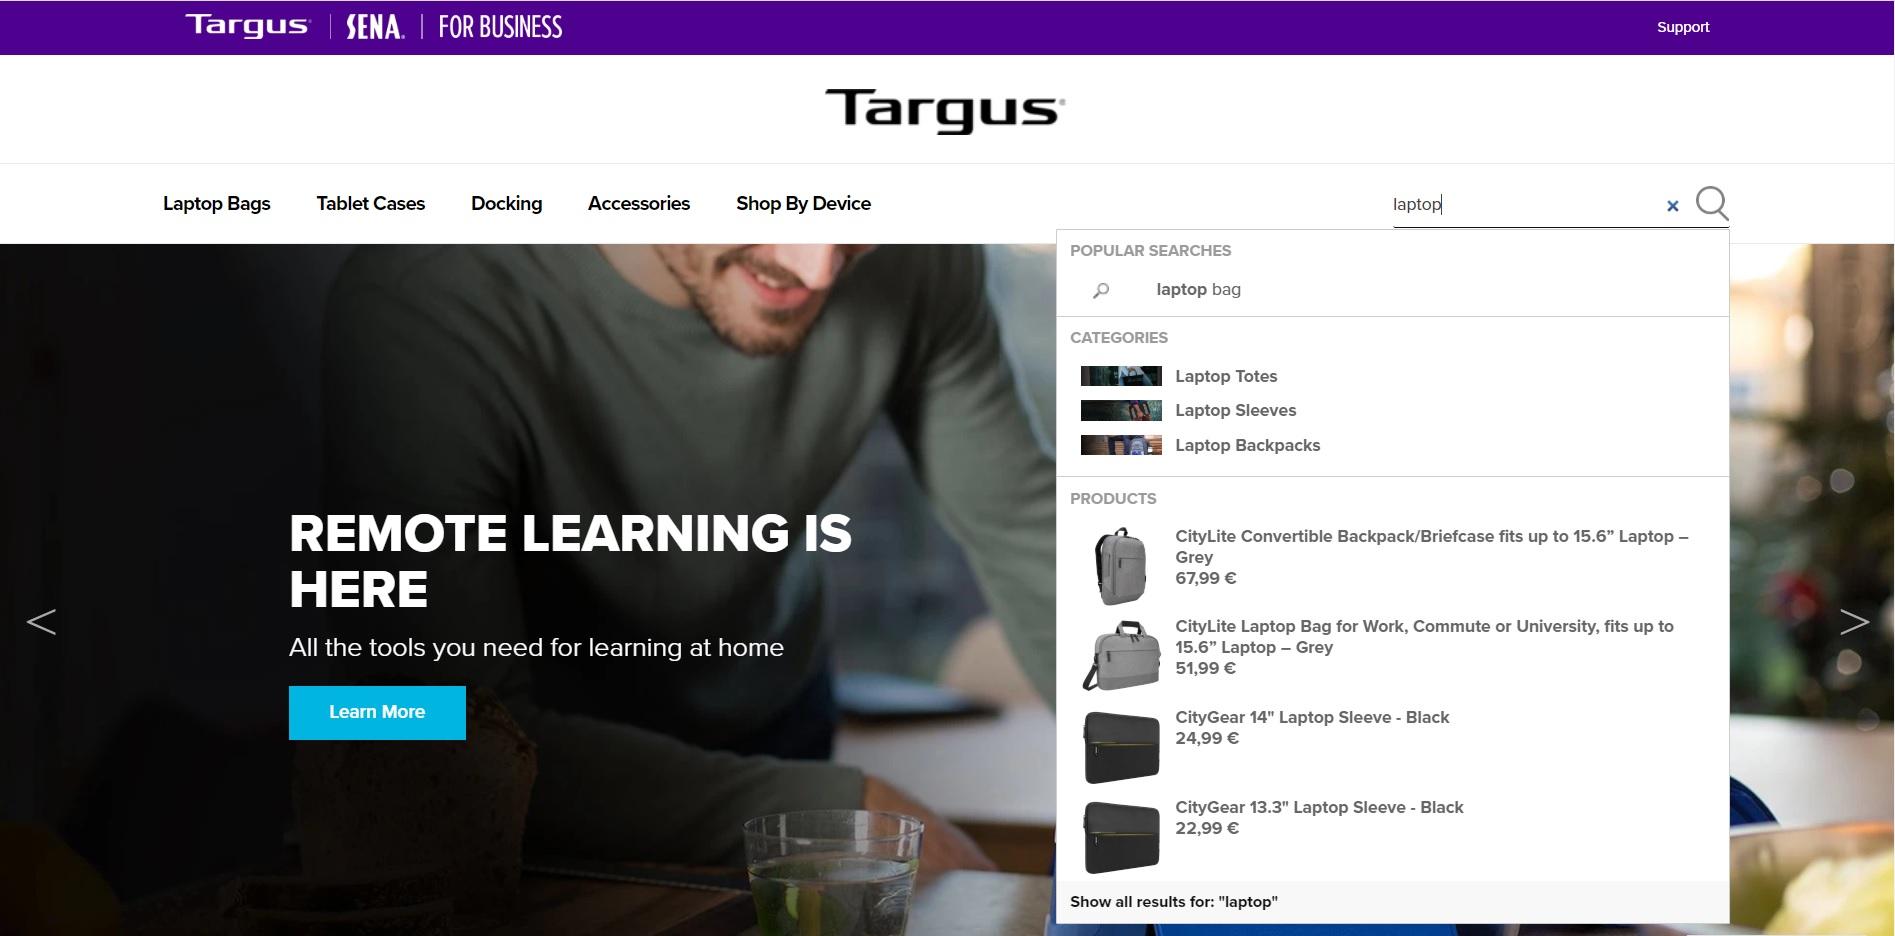 Targus website snapshot